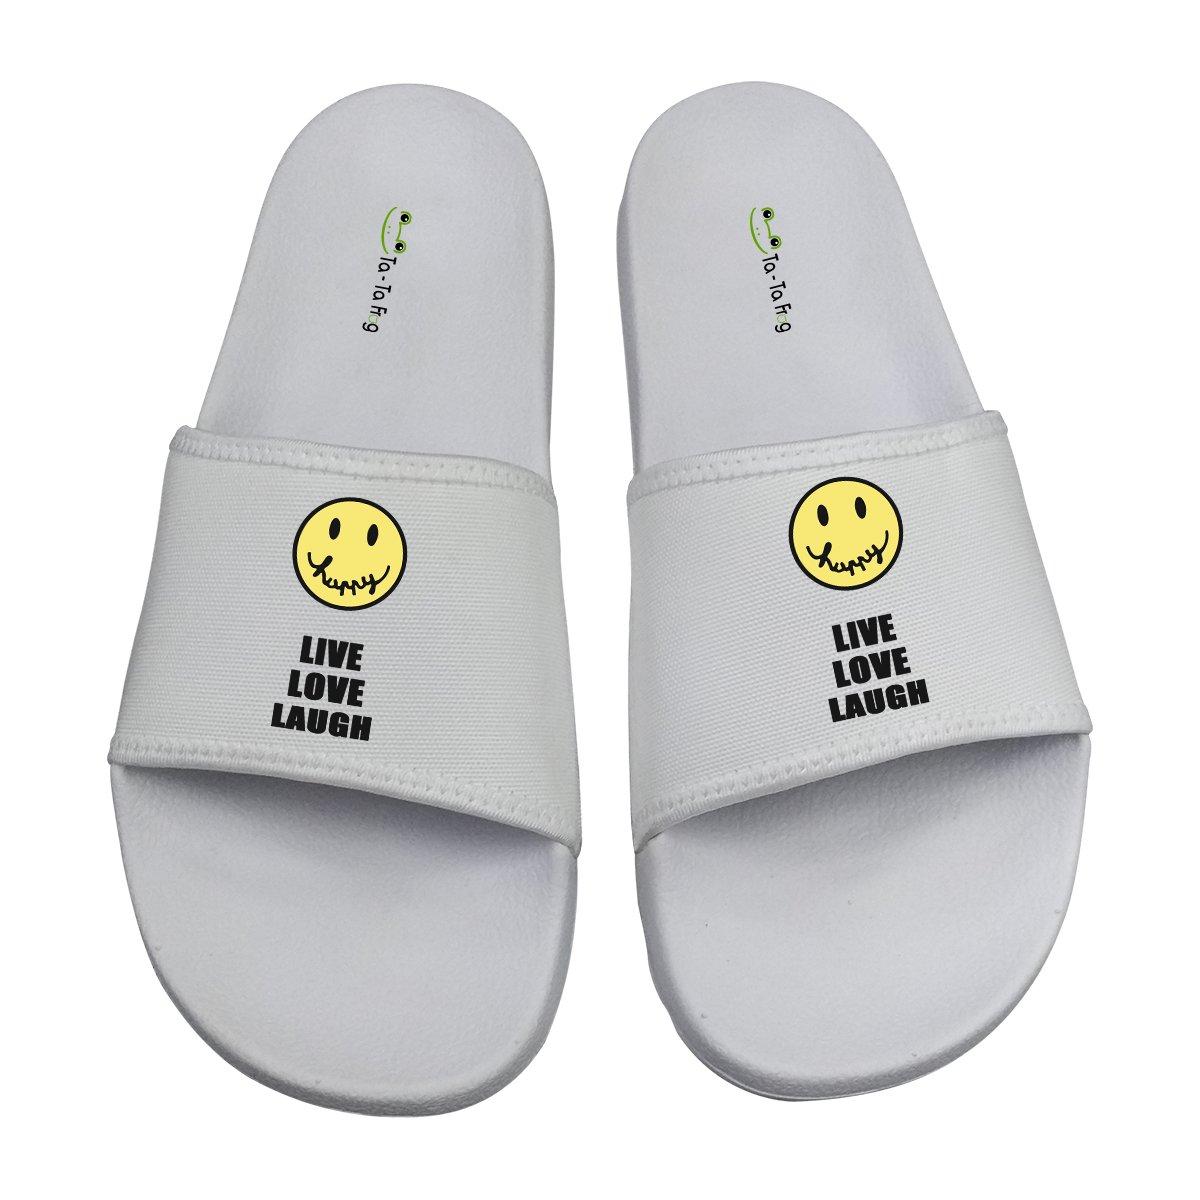 TA-TA FROG Live Love Laugh Cute Emoji Sandals Indoor & Outdoor Slippers 9 D(M) US